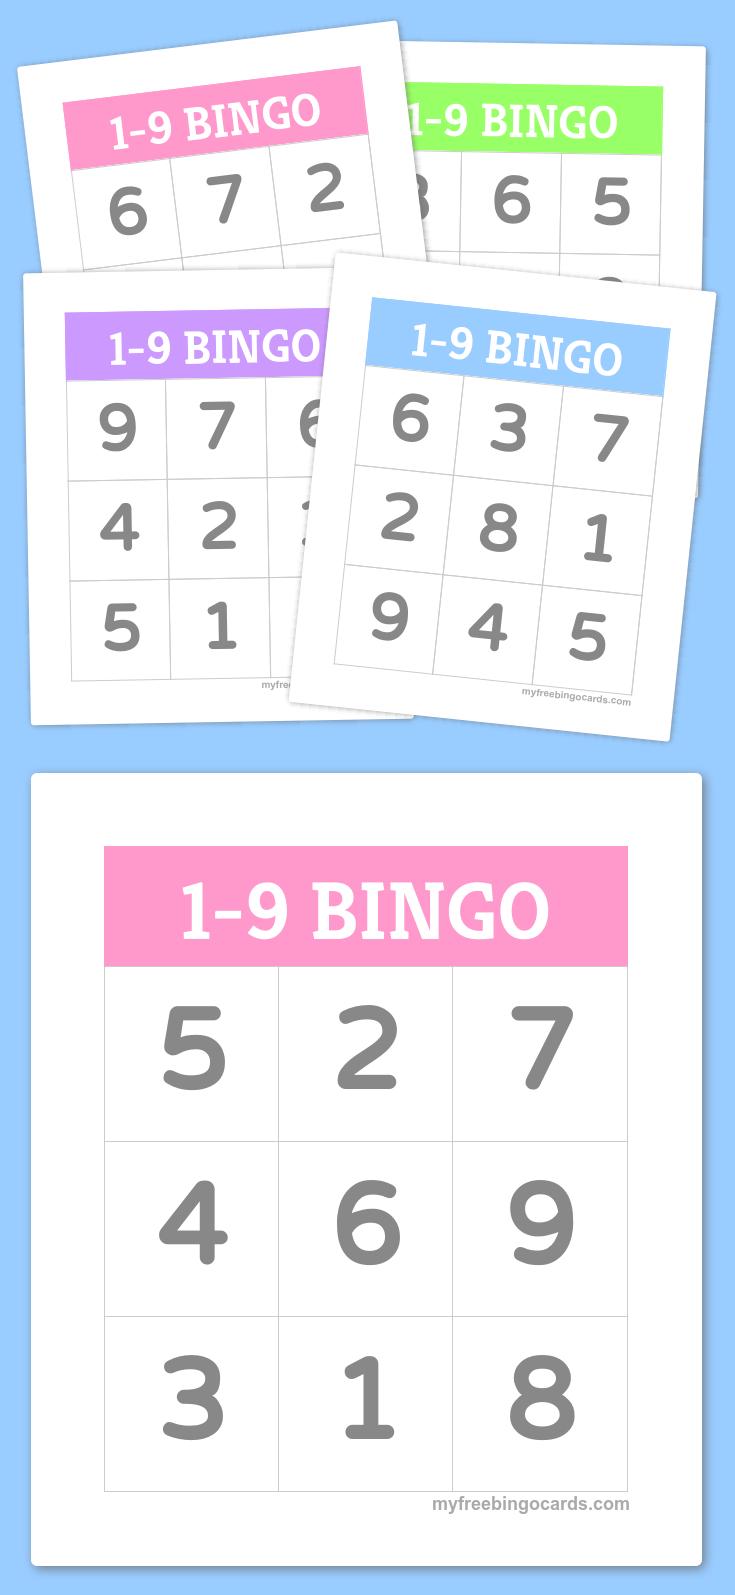 1-9 Bingo | Numbers | Bingo For Kids, Bingo, Free Printable Bingo Cards - Free Printable Bingo Cards Random Numbers